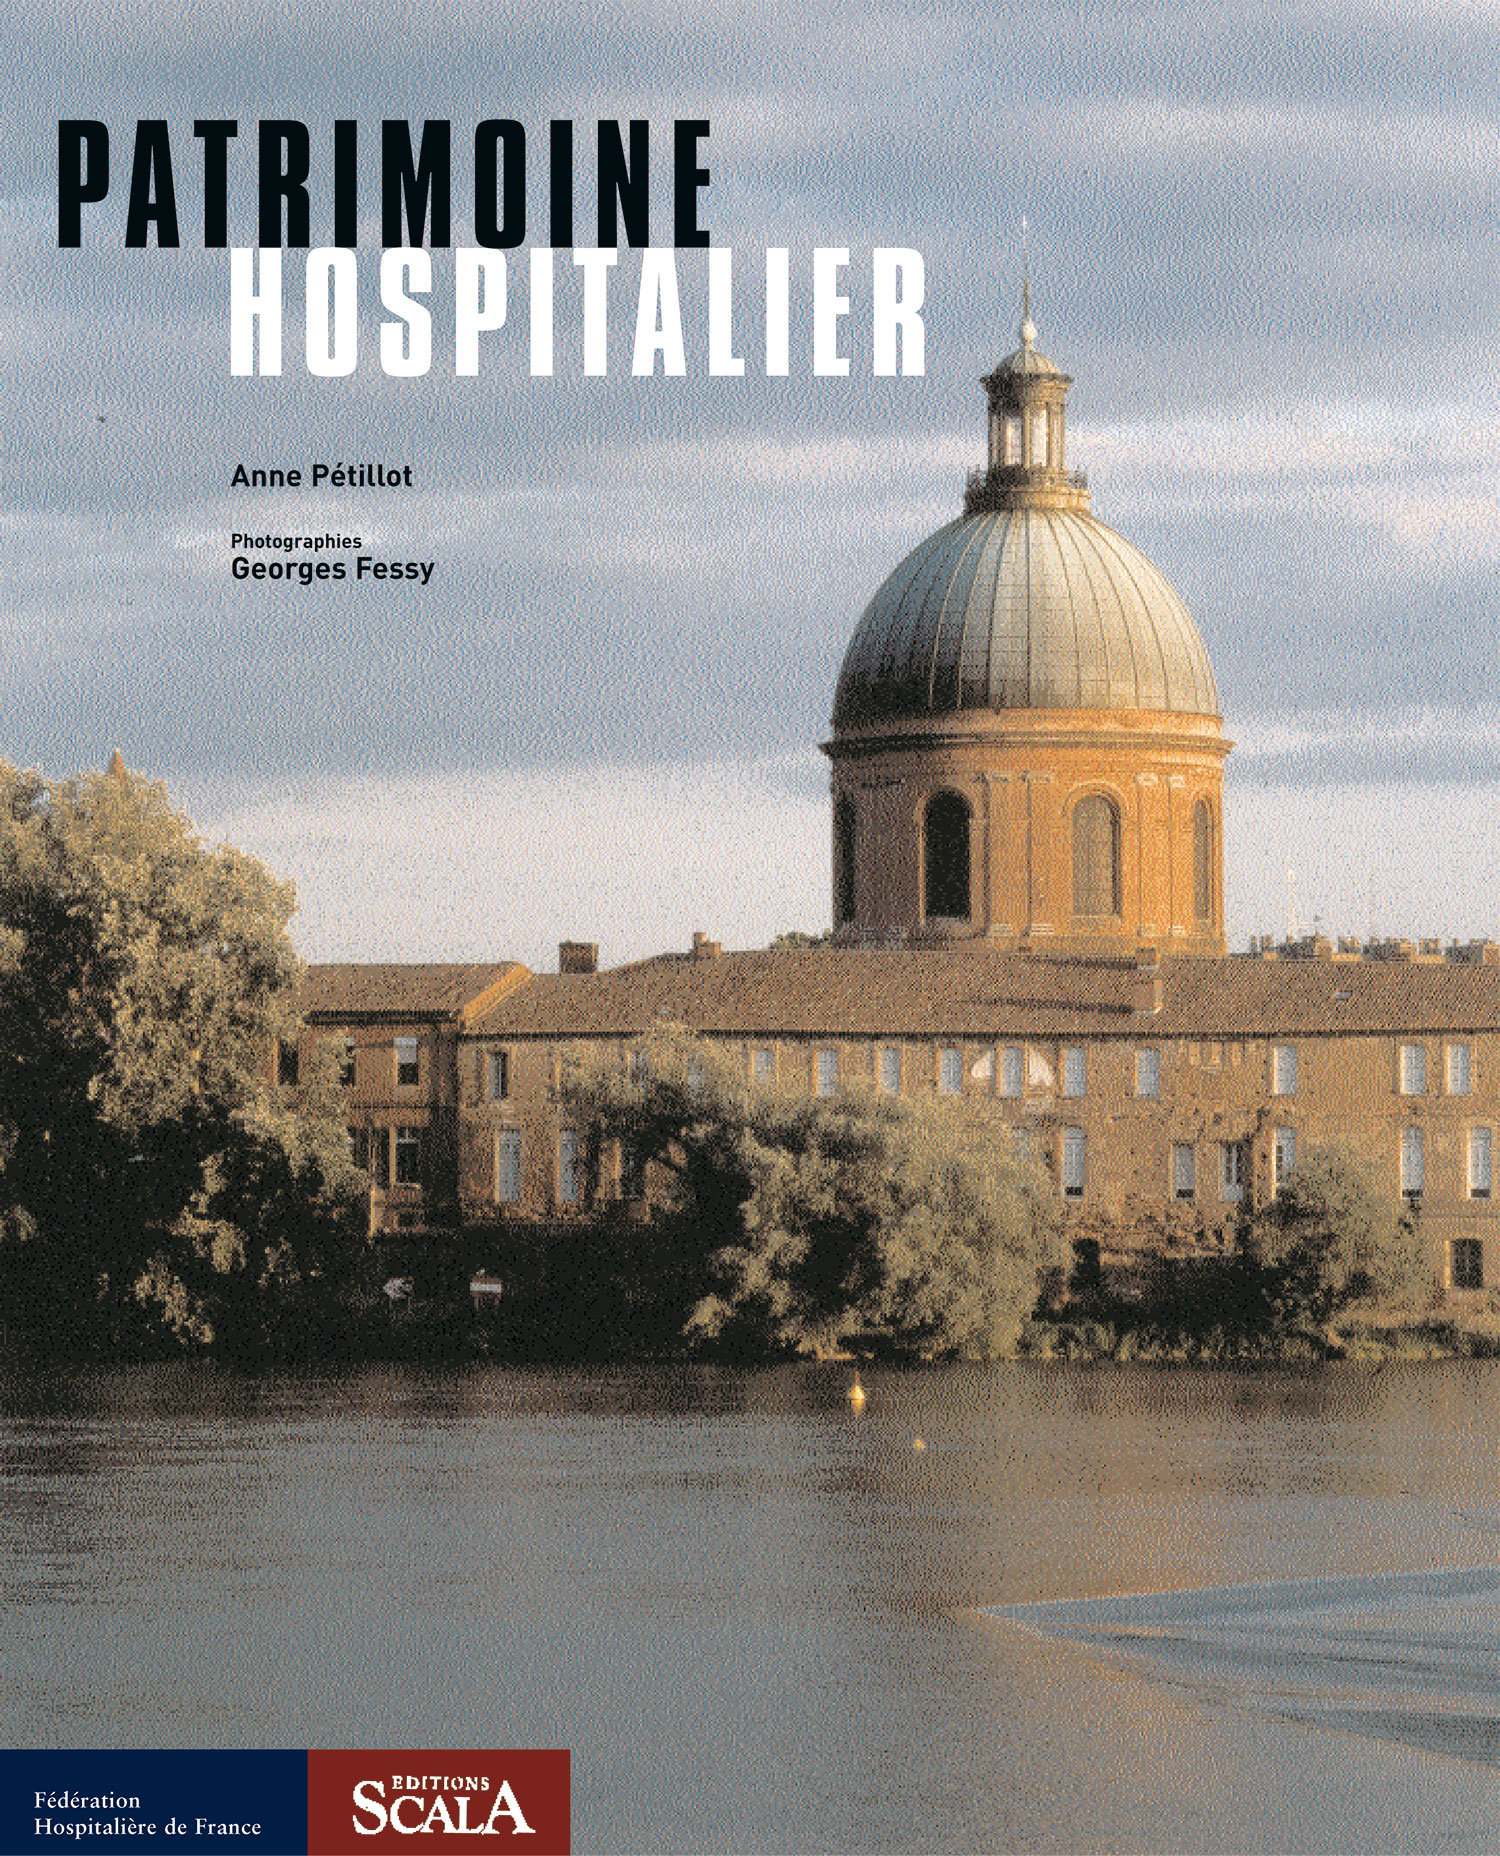 Patrimoine hospitalier Collection « Patrimoine » Éditions Scala